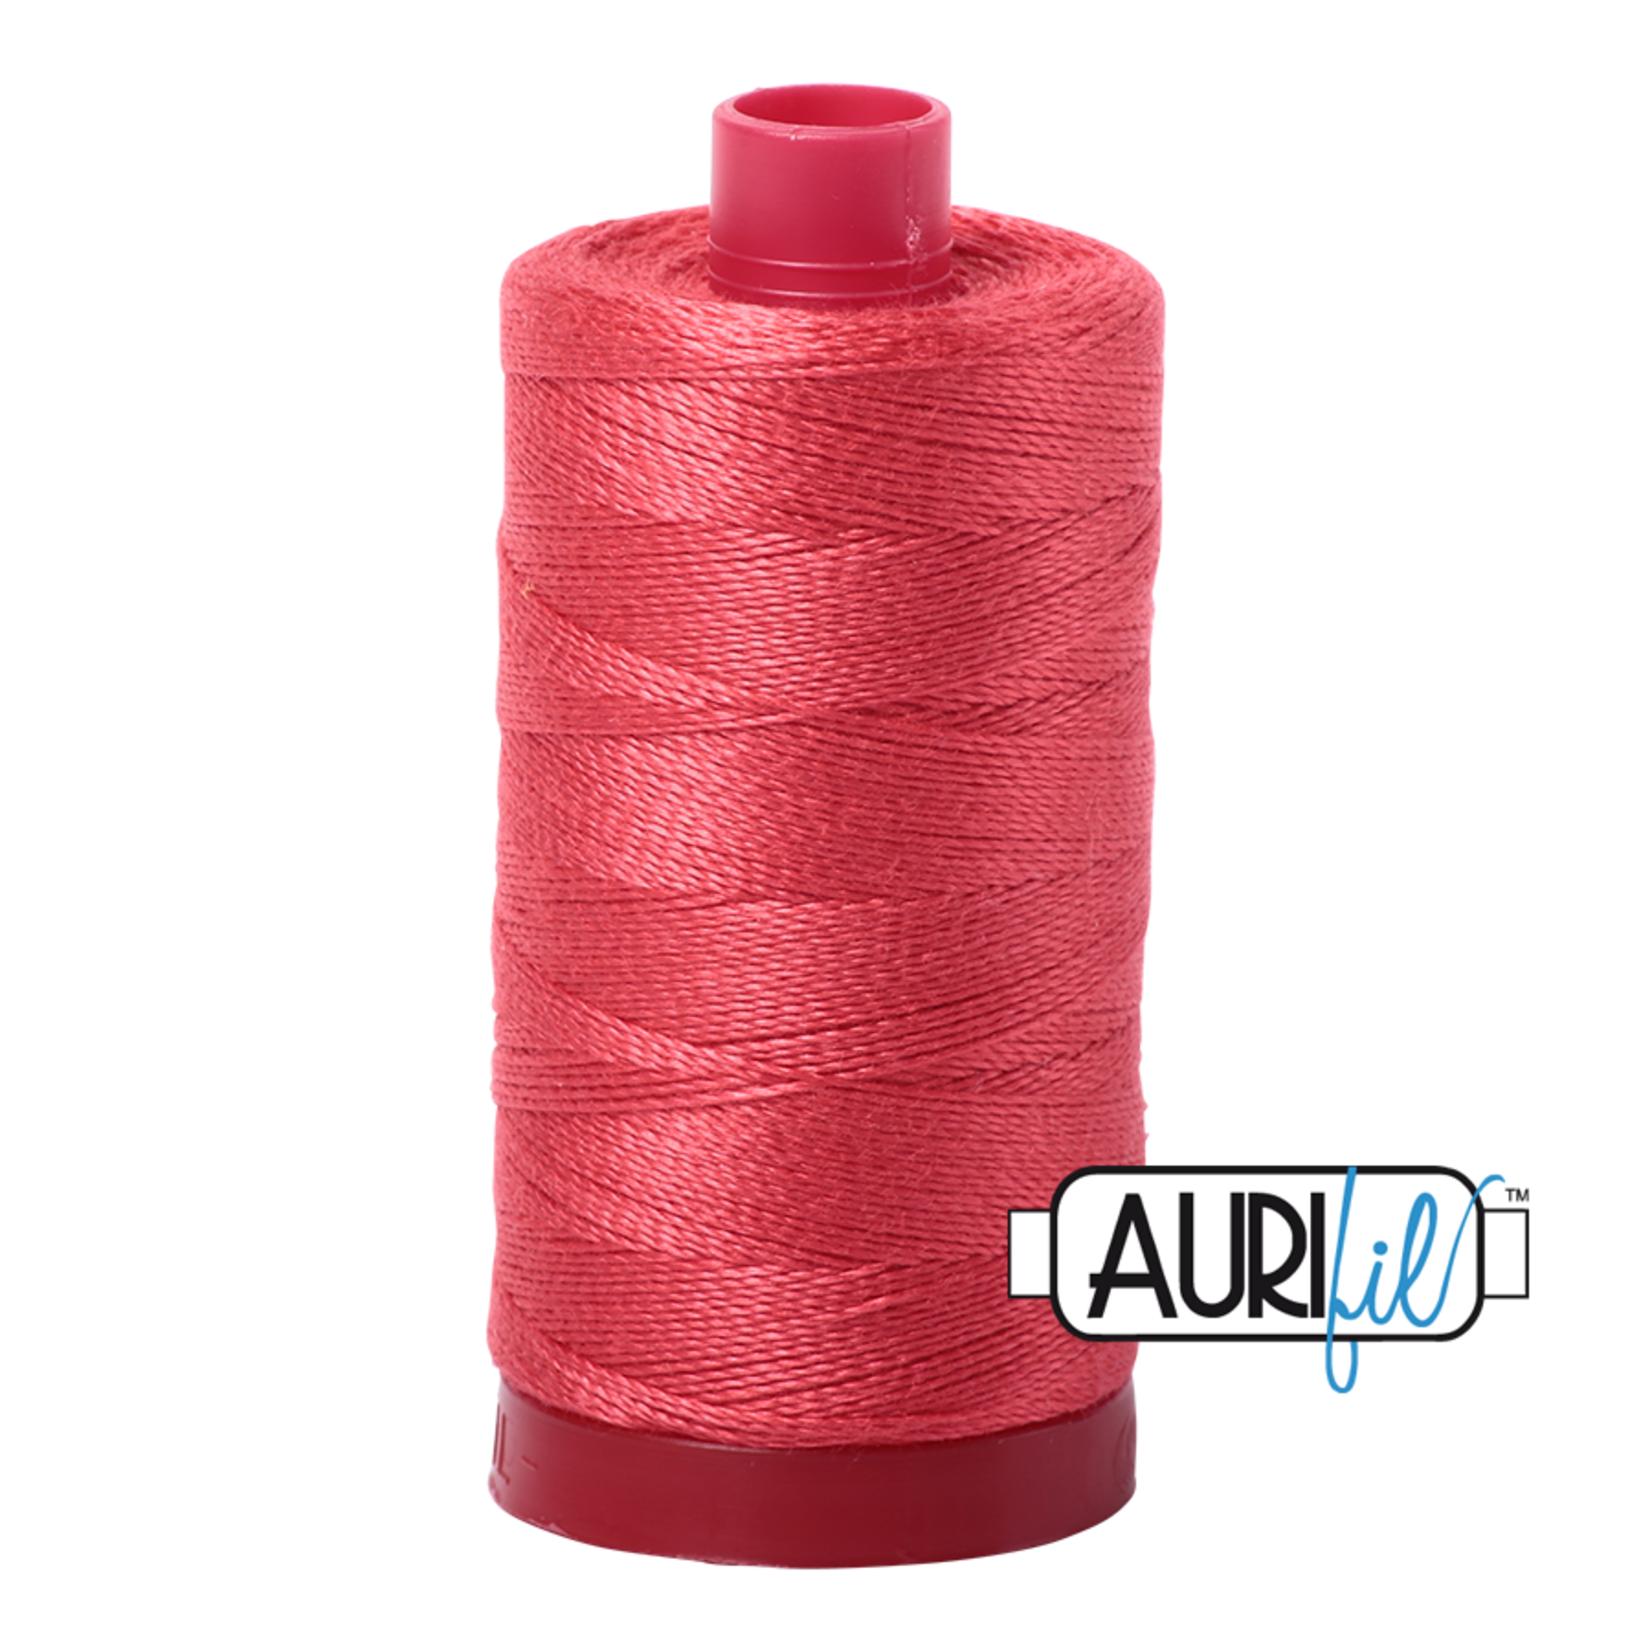 AURIFIL AURIFIL 12 WT Medium Red 5002